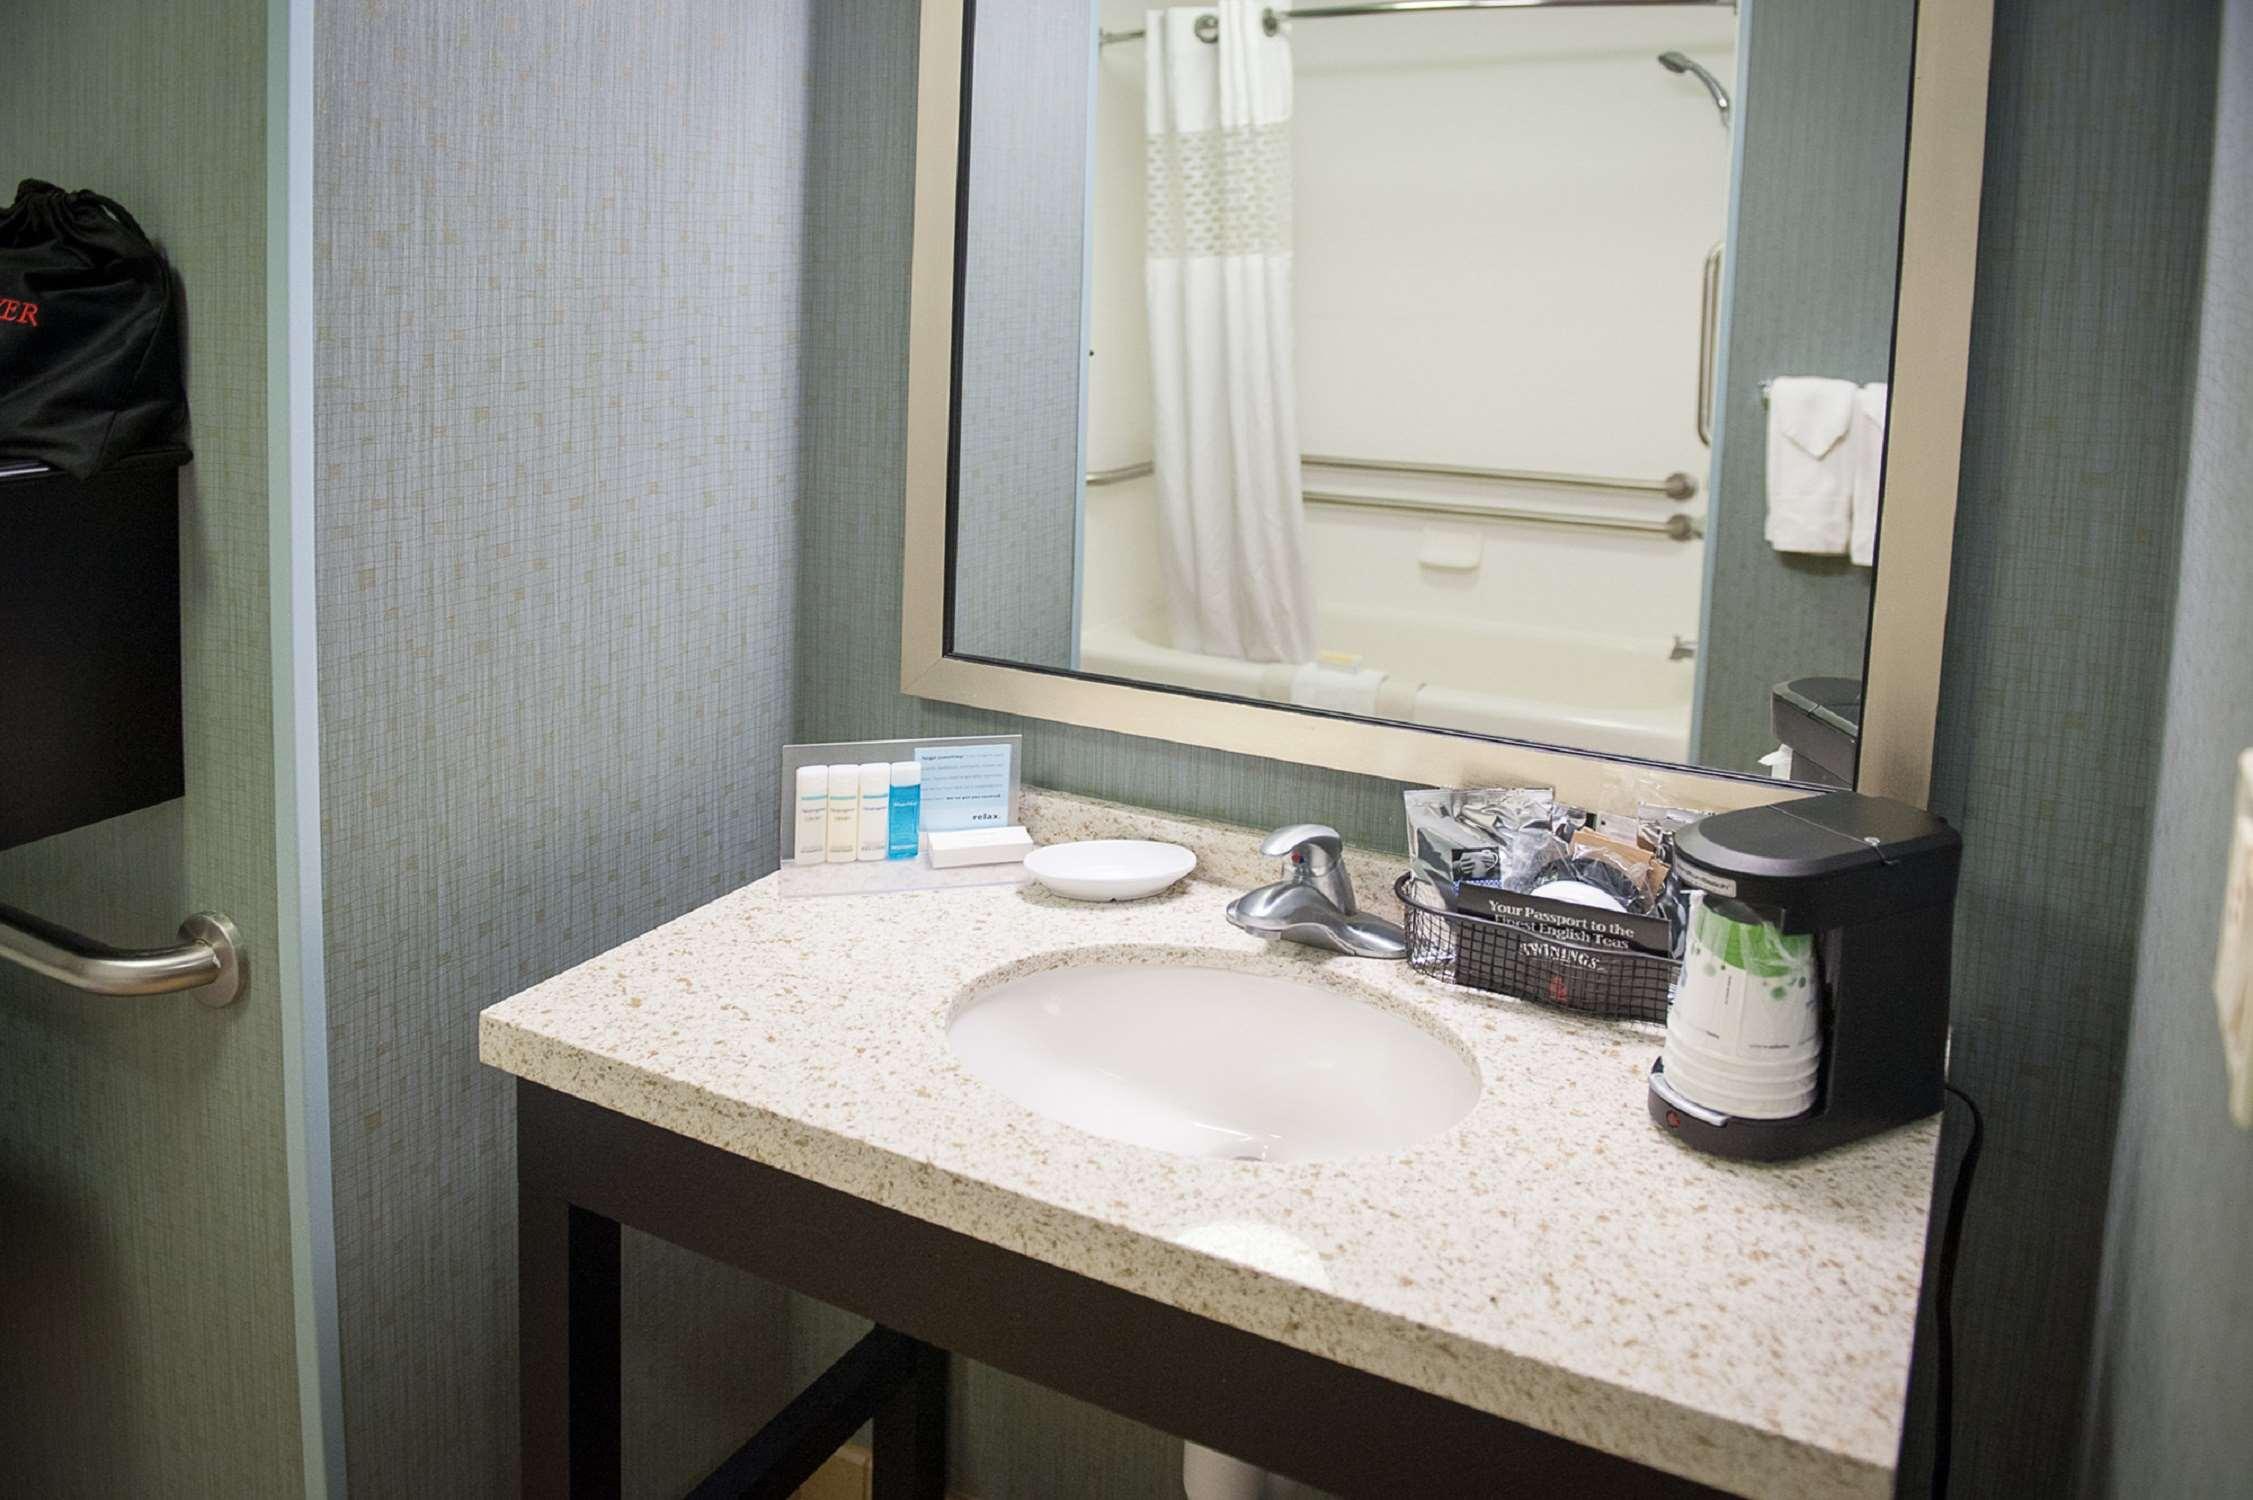 Hampton Inn & Suites St. Petersburg/Downtown image 17